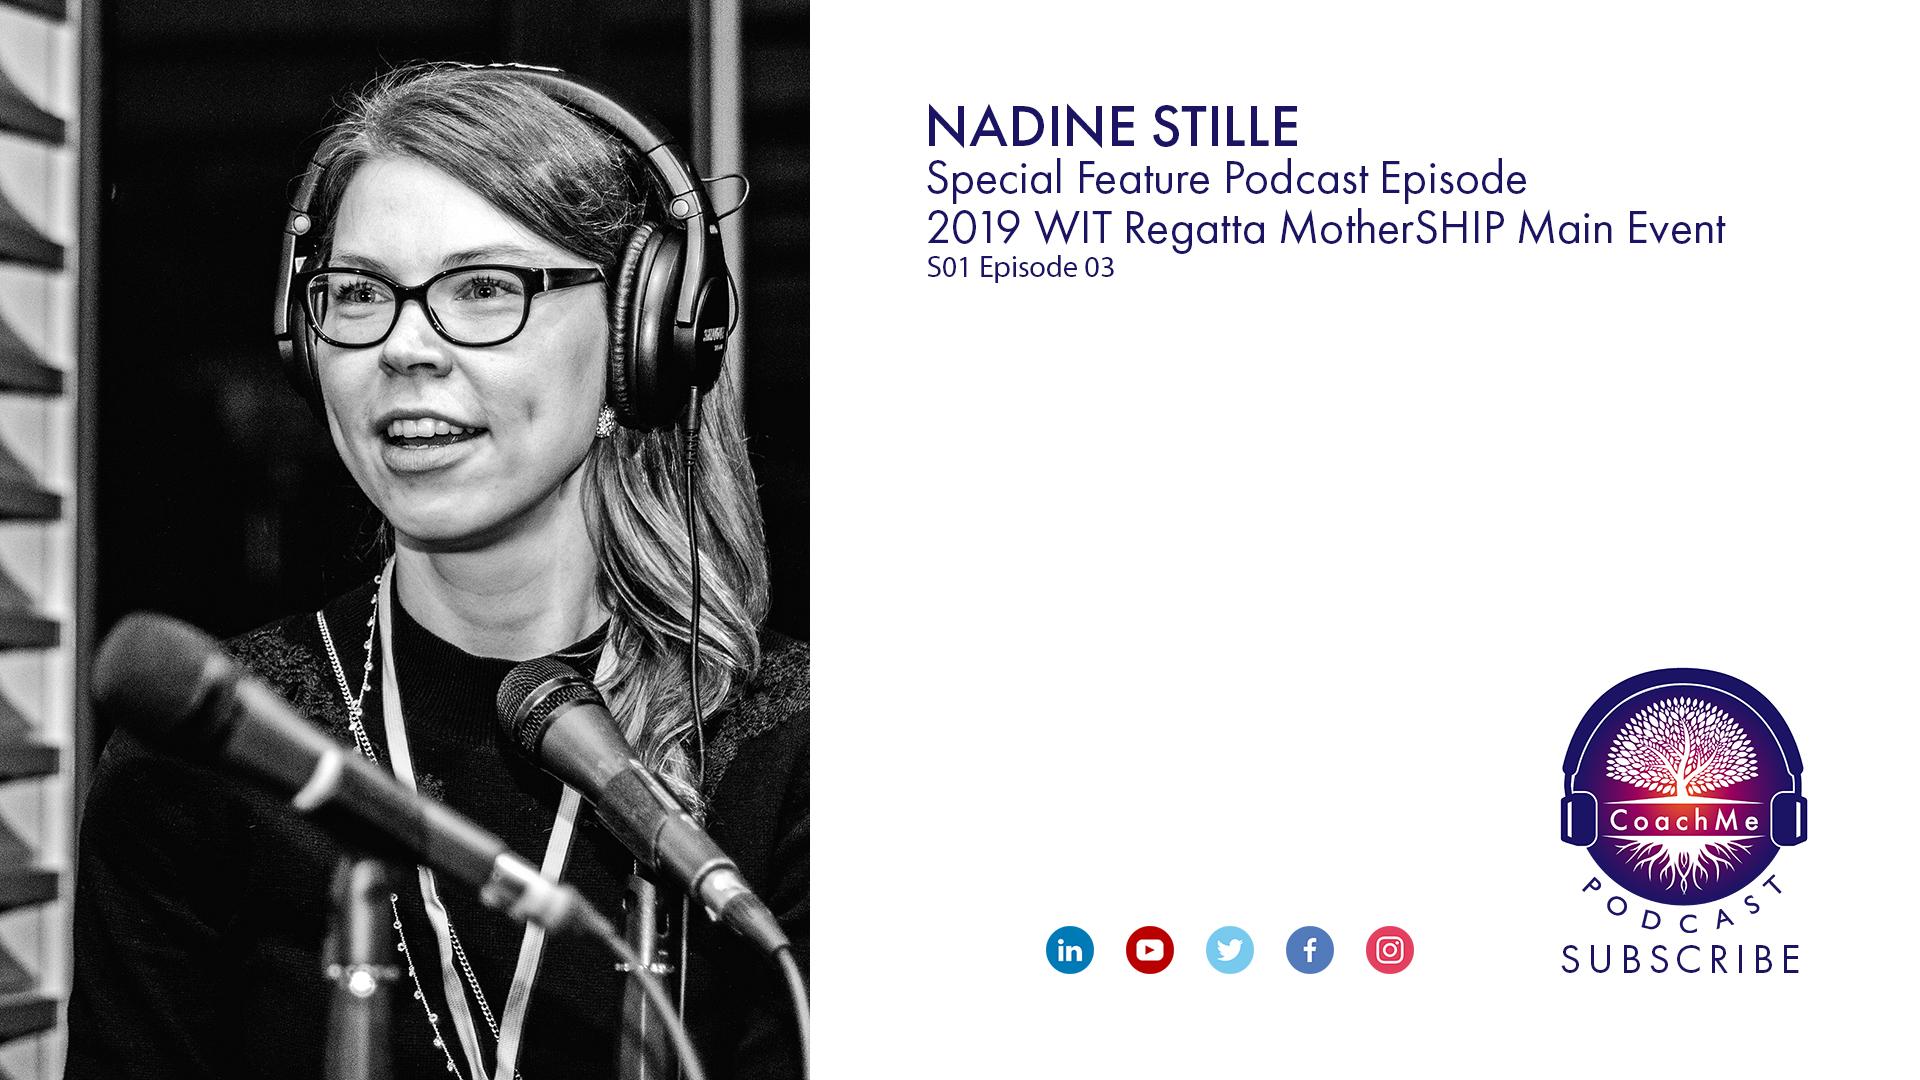 Coach in Vancouver Podcast WiT Regatta - Nadine Stille - CoachMe Vancouver